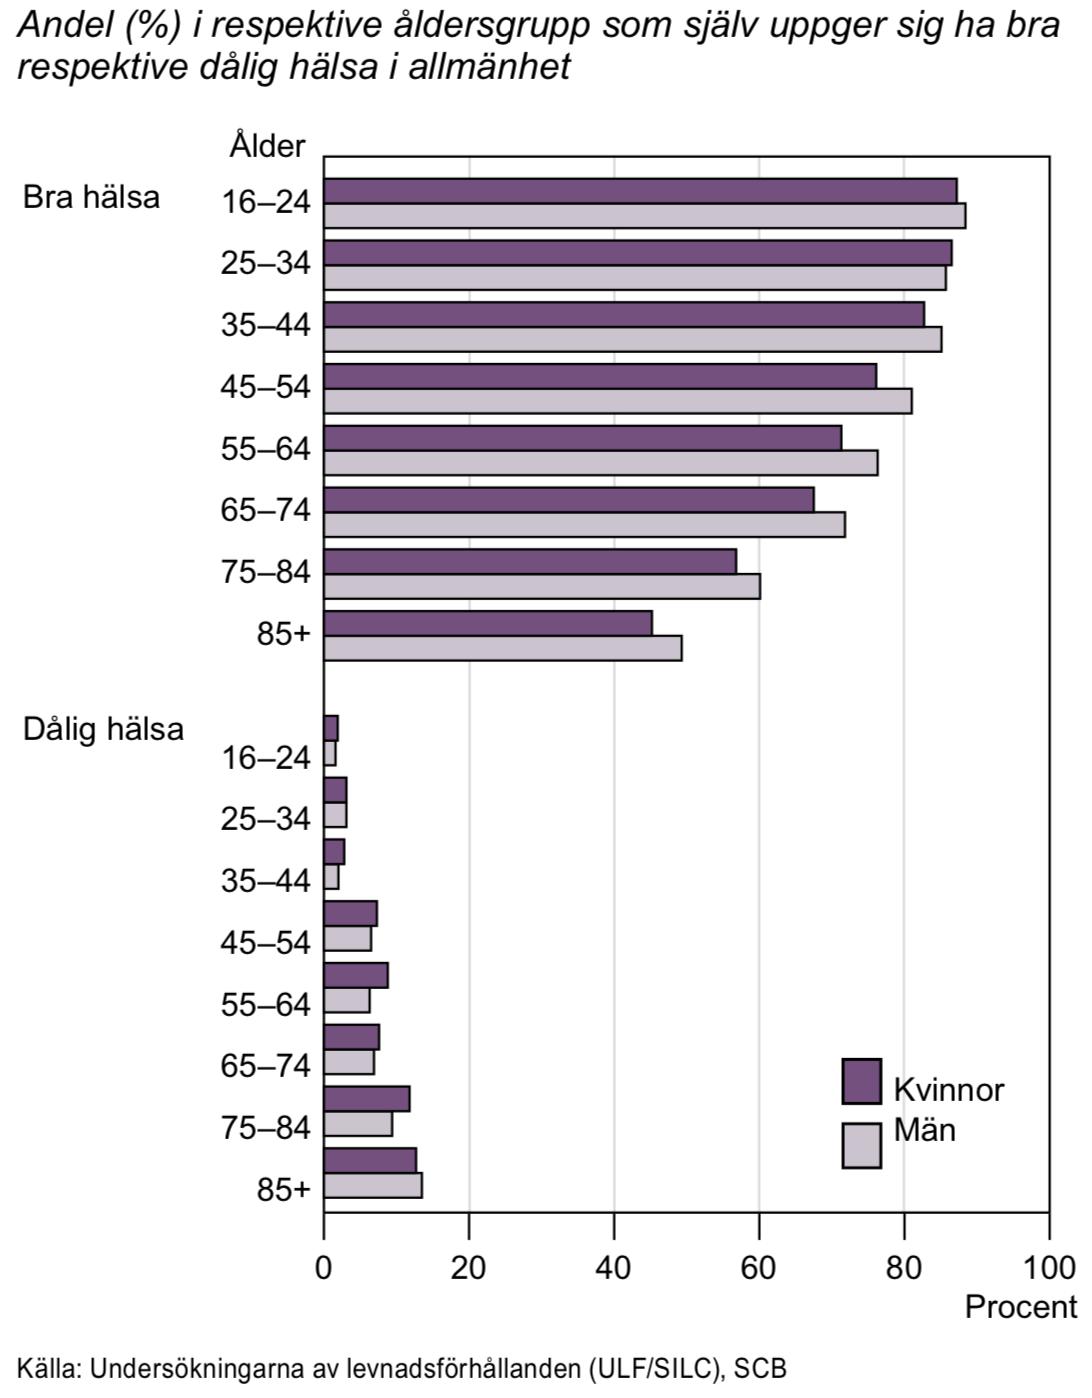 Självupplevd hälsa 2014-2015